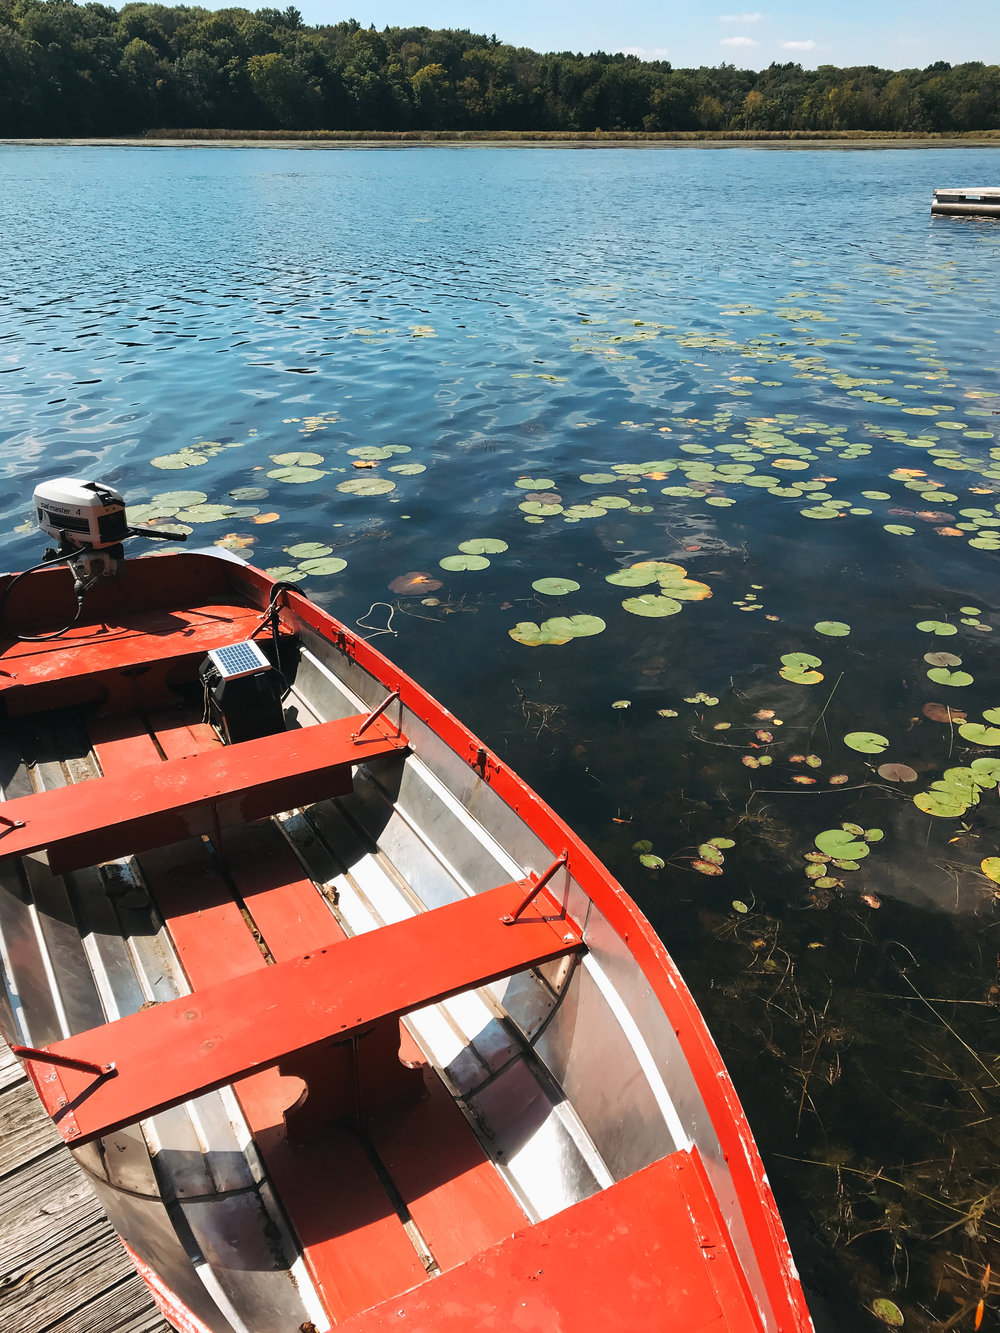 camp_wandawega_red_boat_lillies_water.jpg